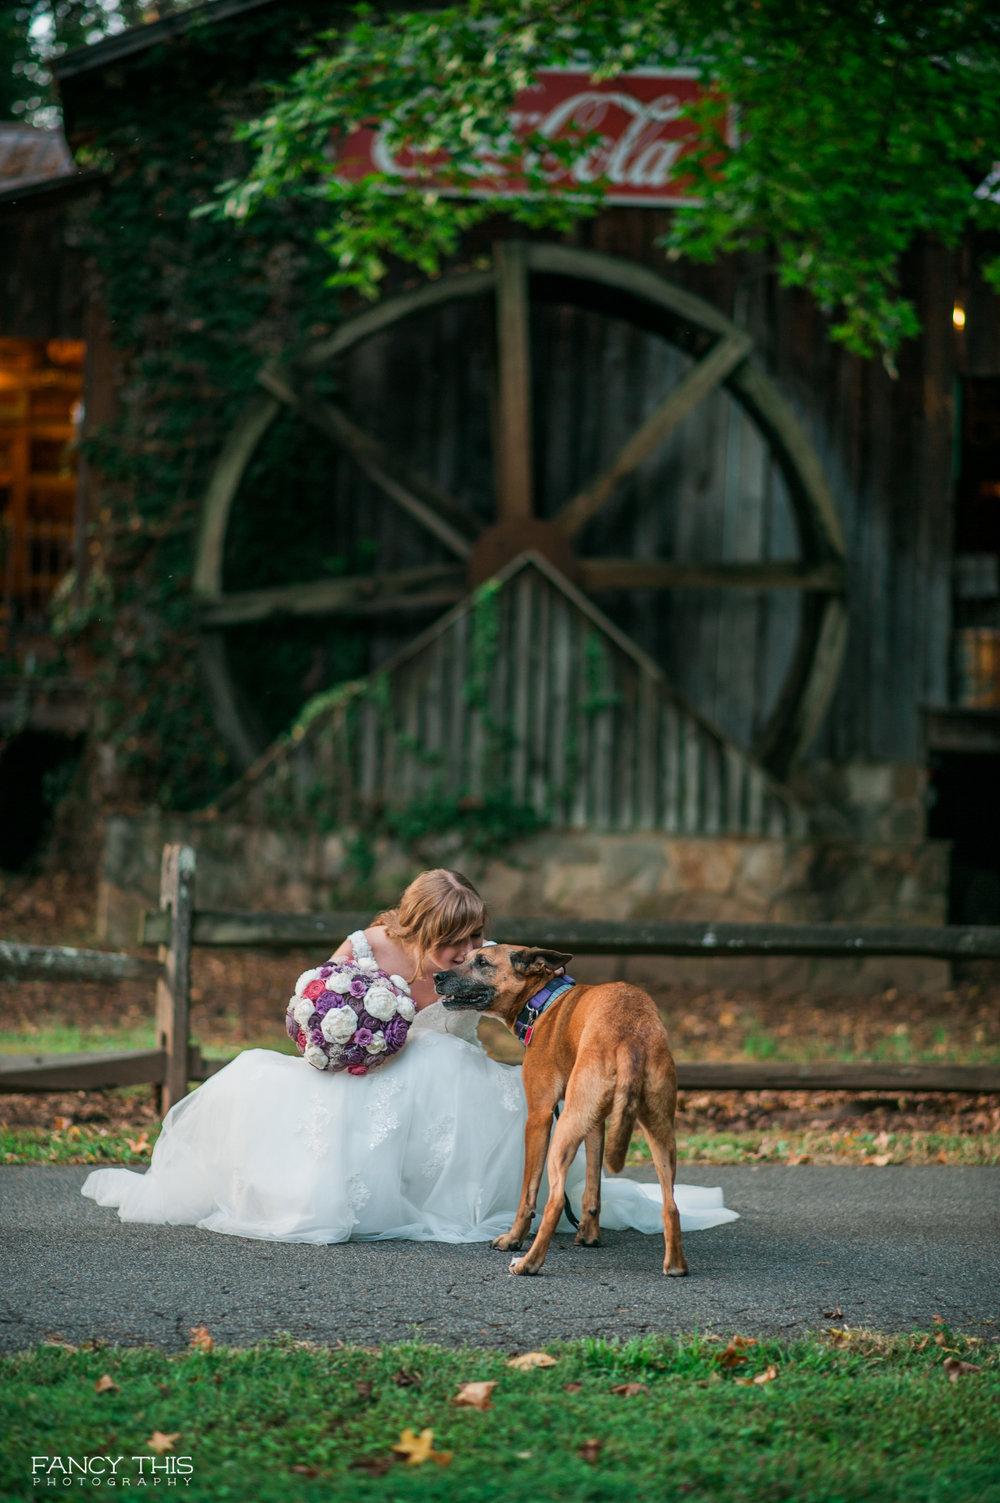 carolsimchik_bridals_socialmediaready-44.jpg